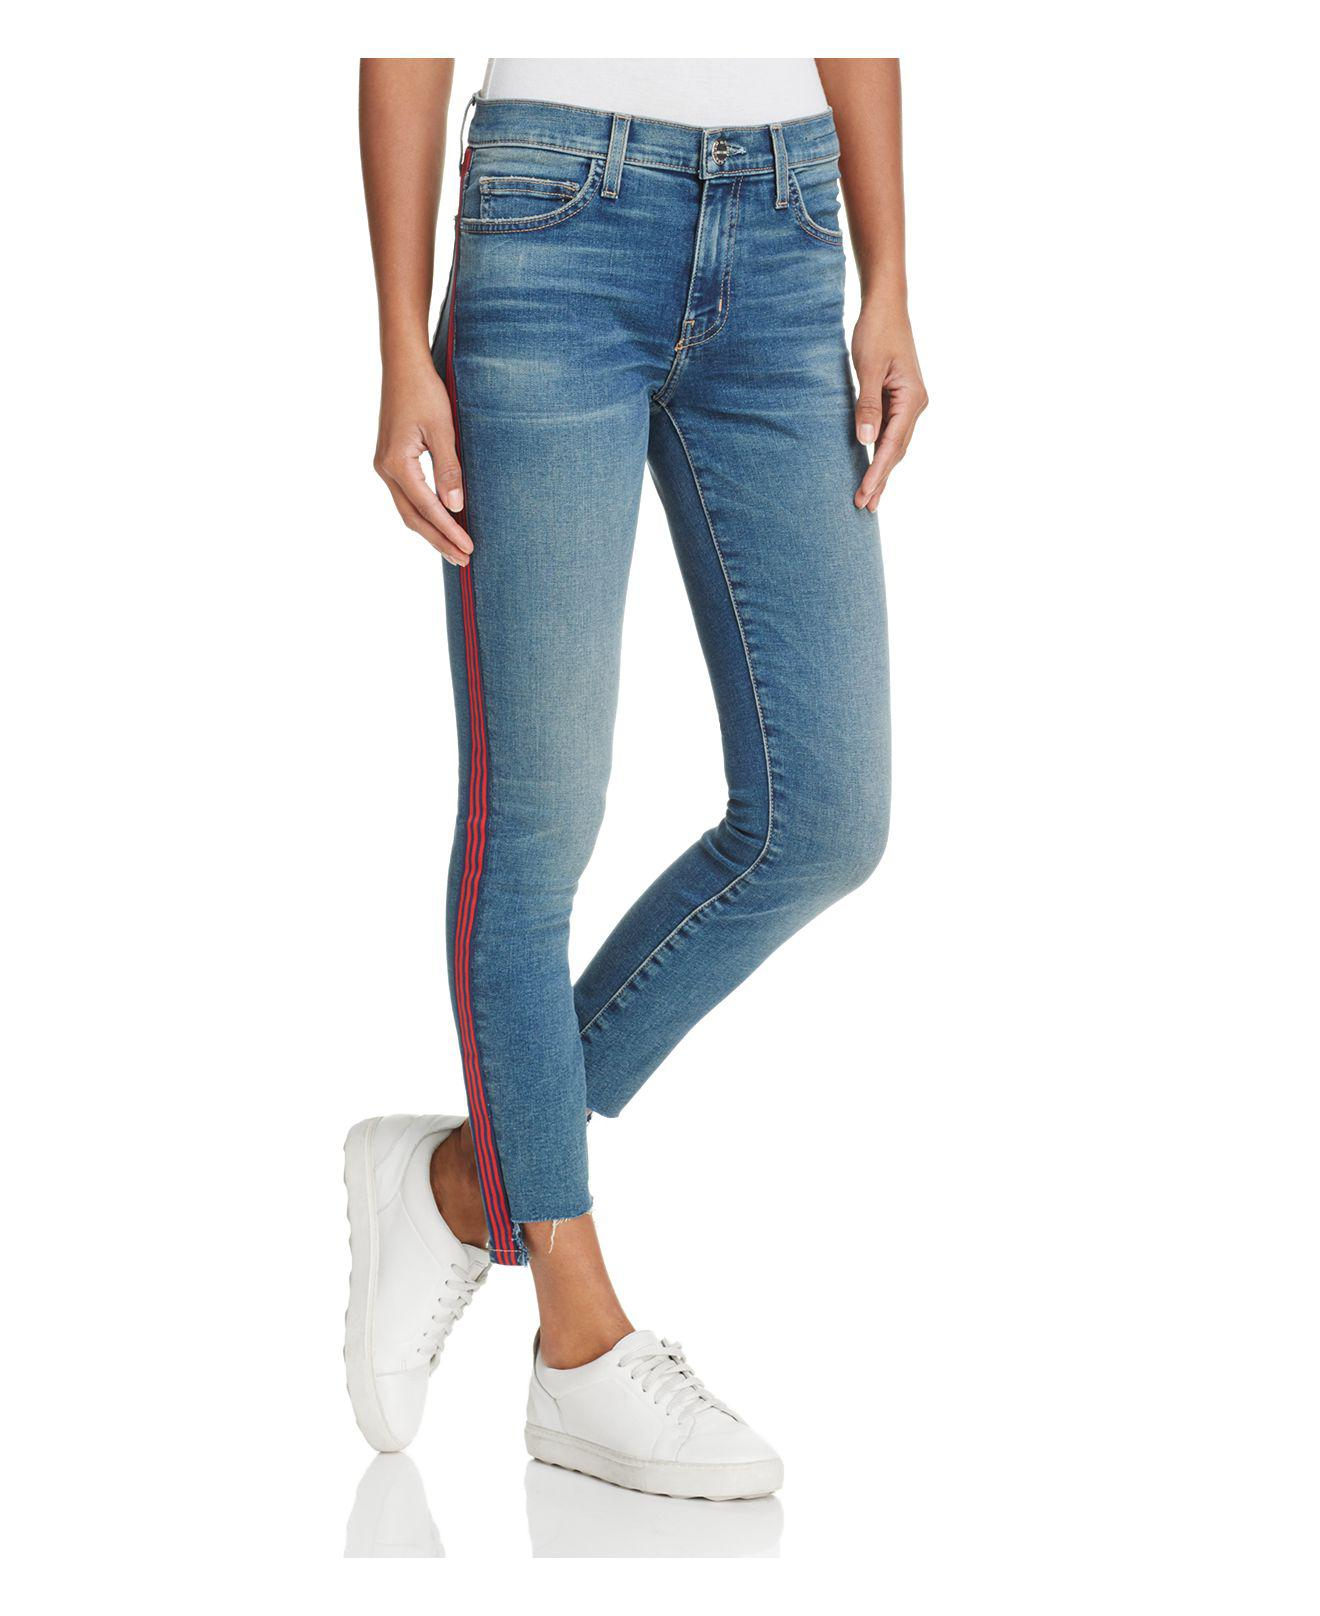 a87341e3d3 Lyst - Current Elliott The Highwaist Stripe Jeans In Powell in Blue